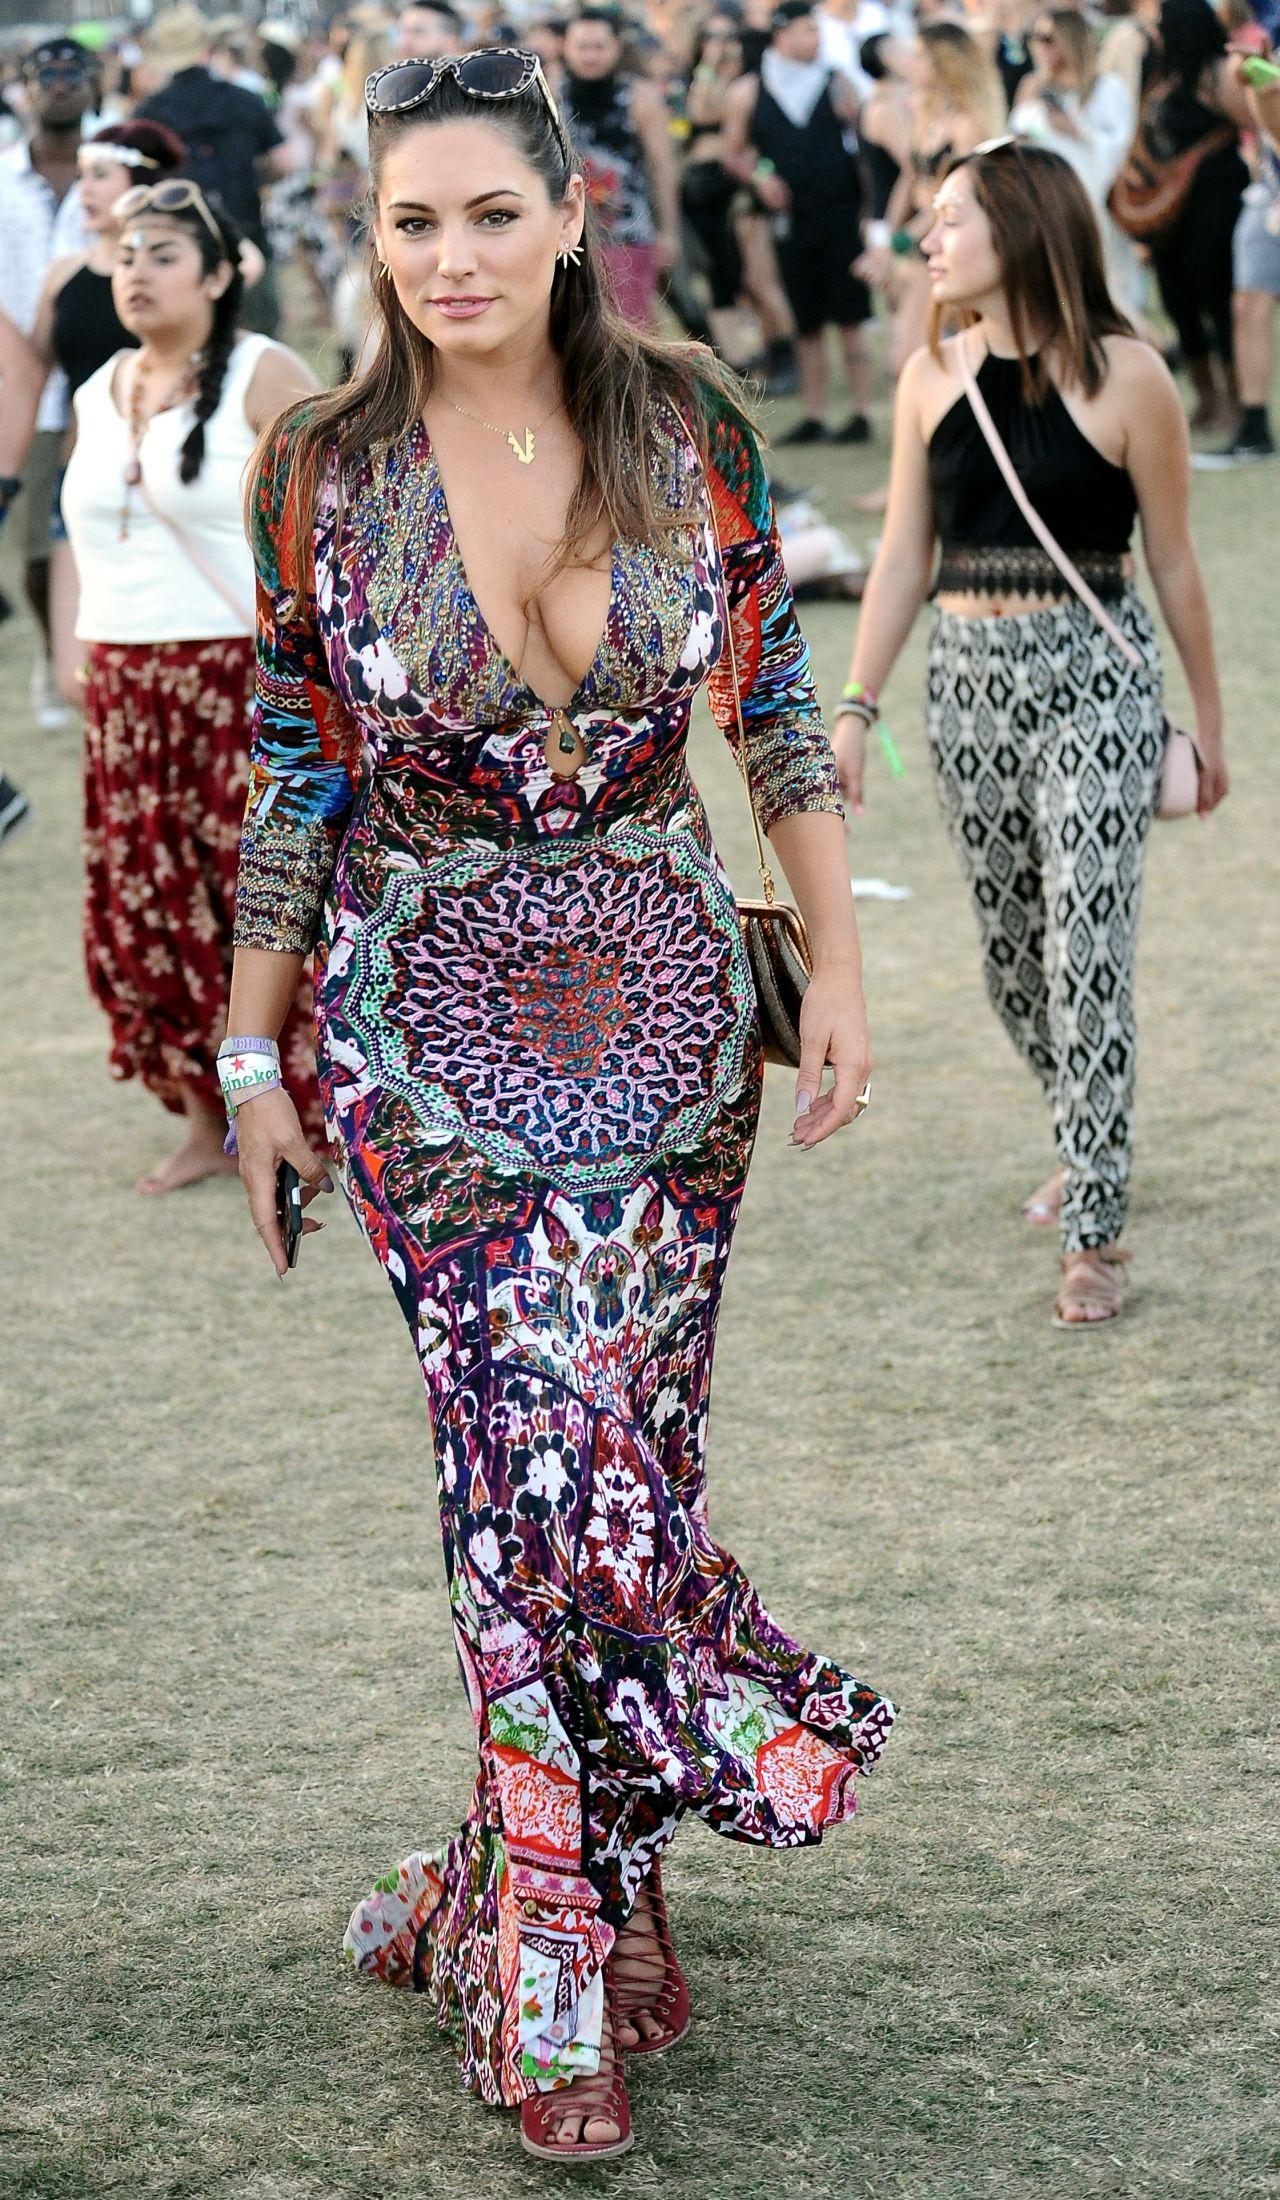 Kelly Brook In Patterned Dress Coachella Music Amp Arts